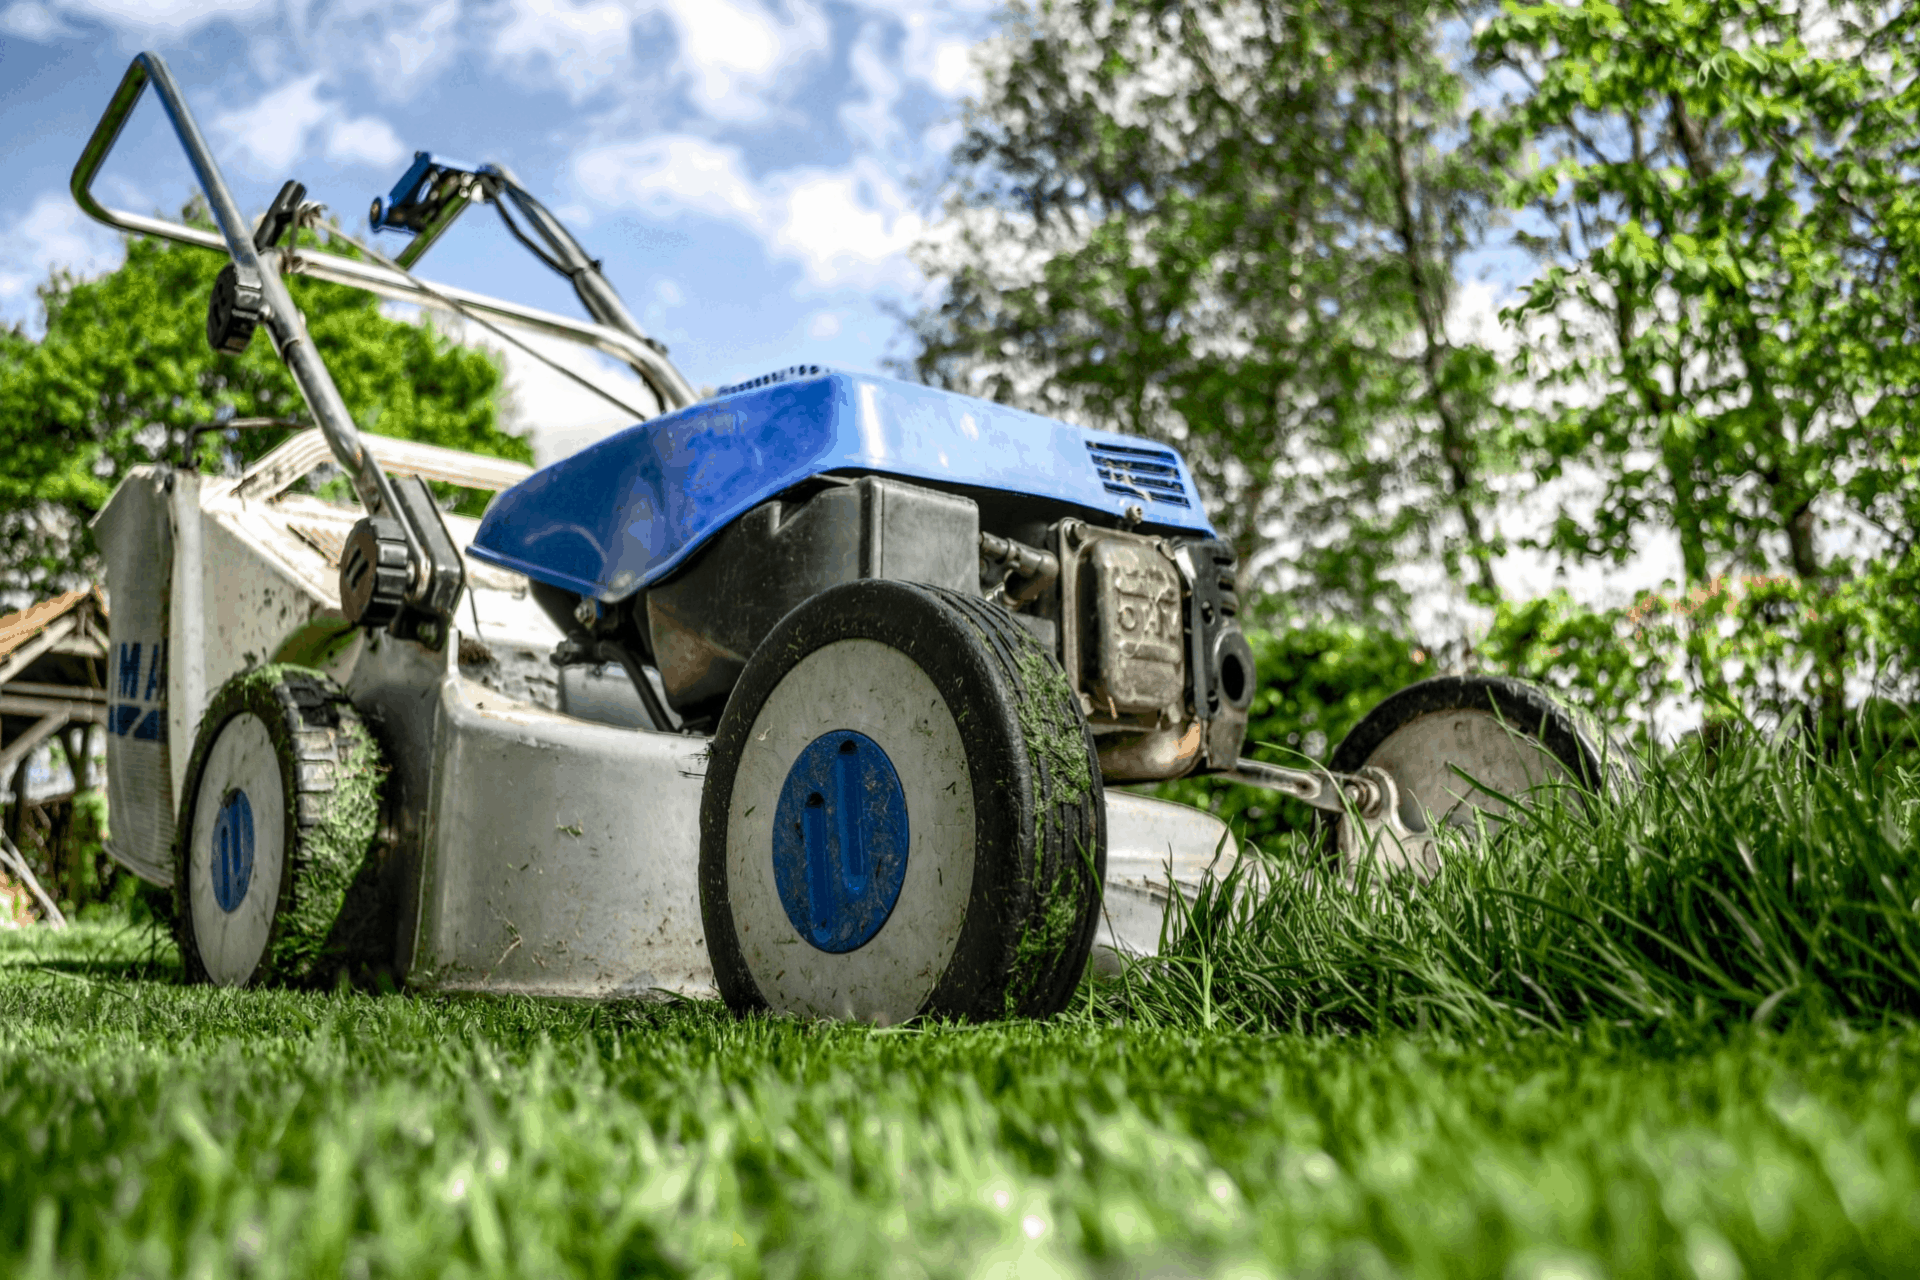 lawnmower 384589 1920 1